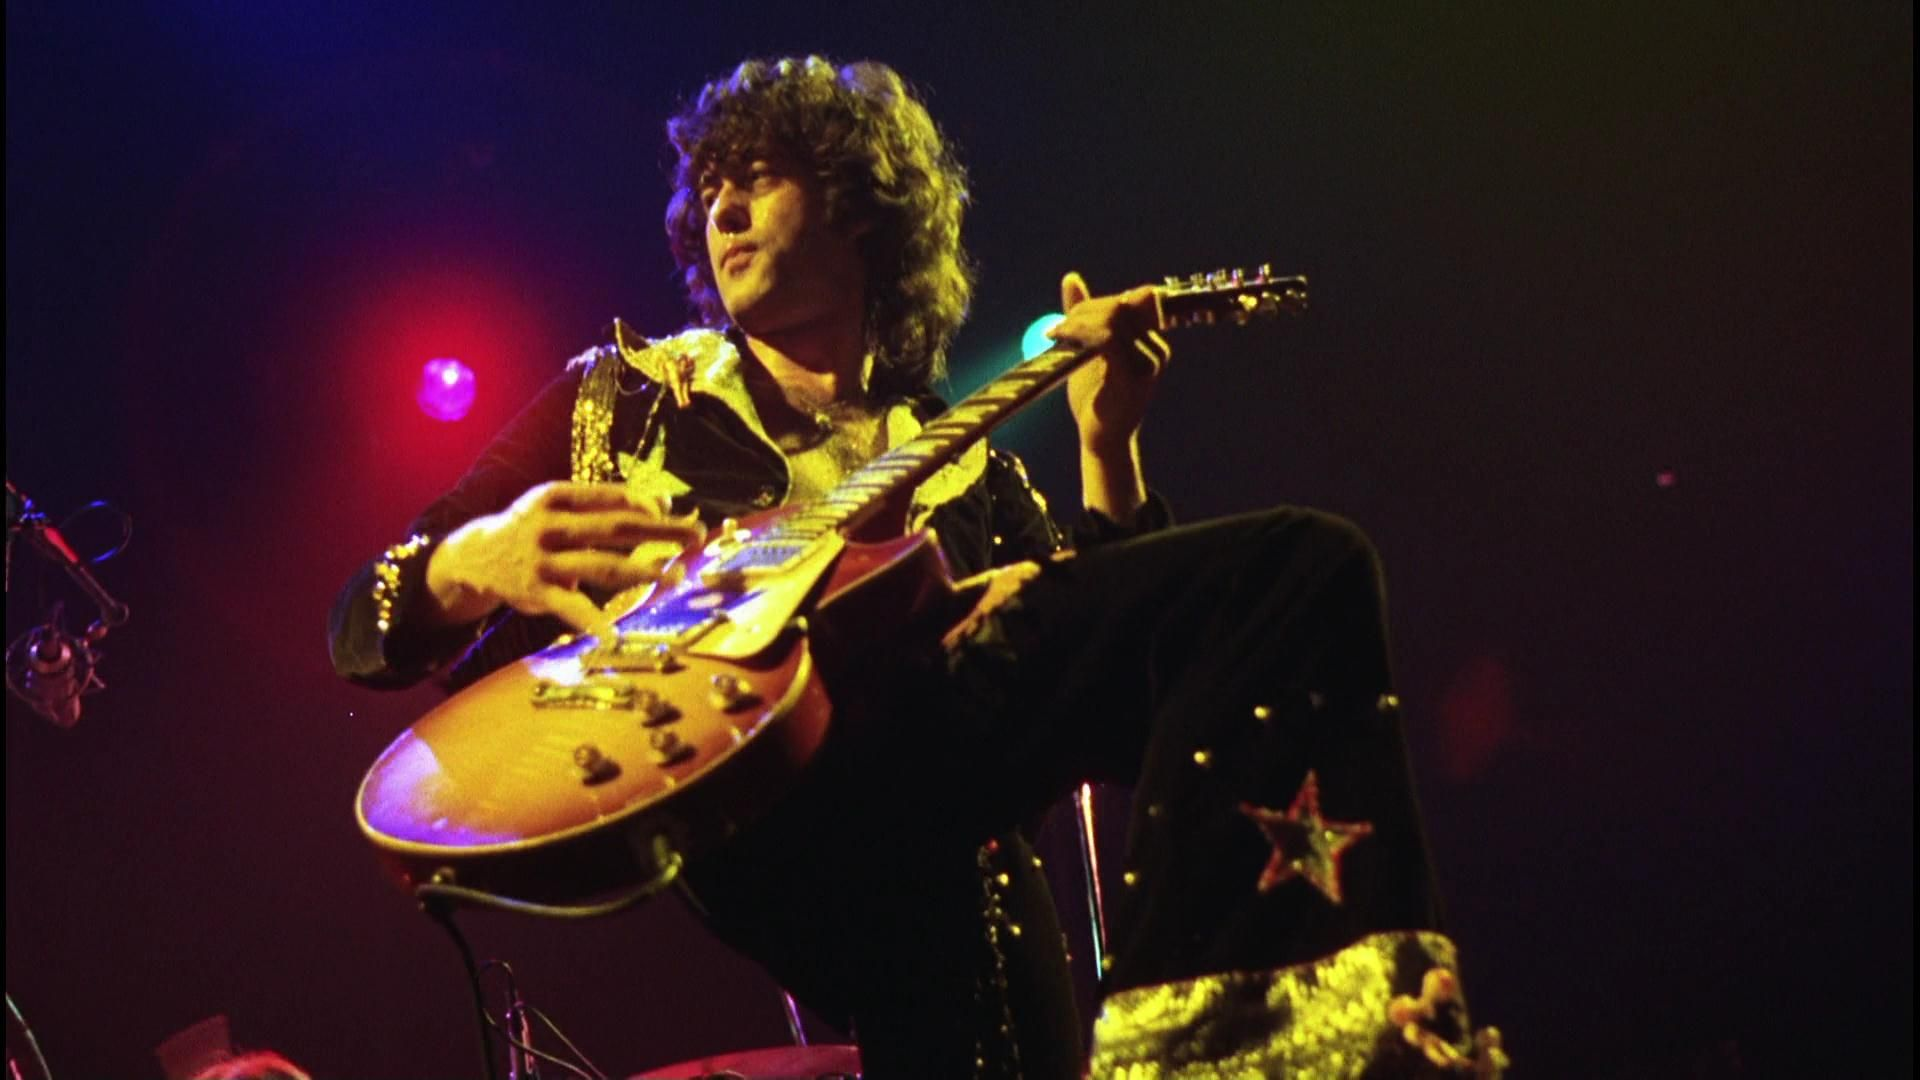 Jimmy Page HD Wallpapers Led Zeppelin